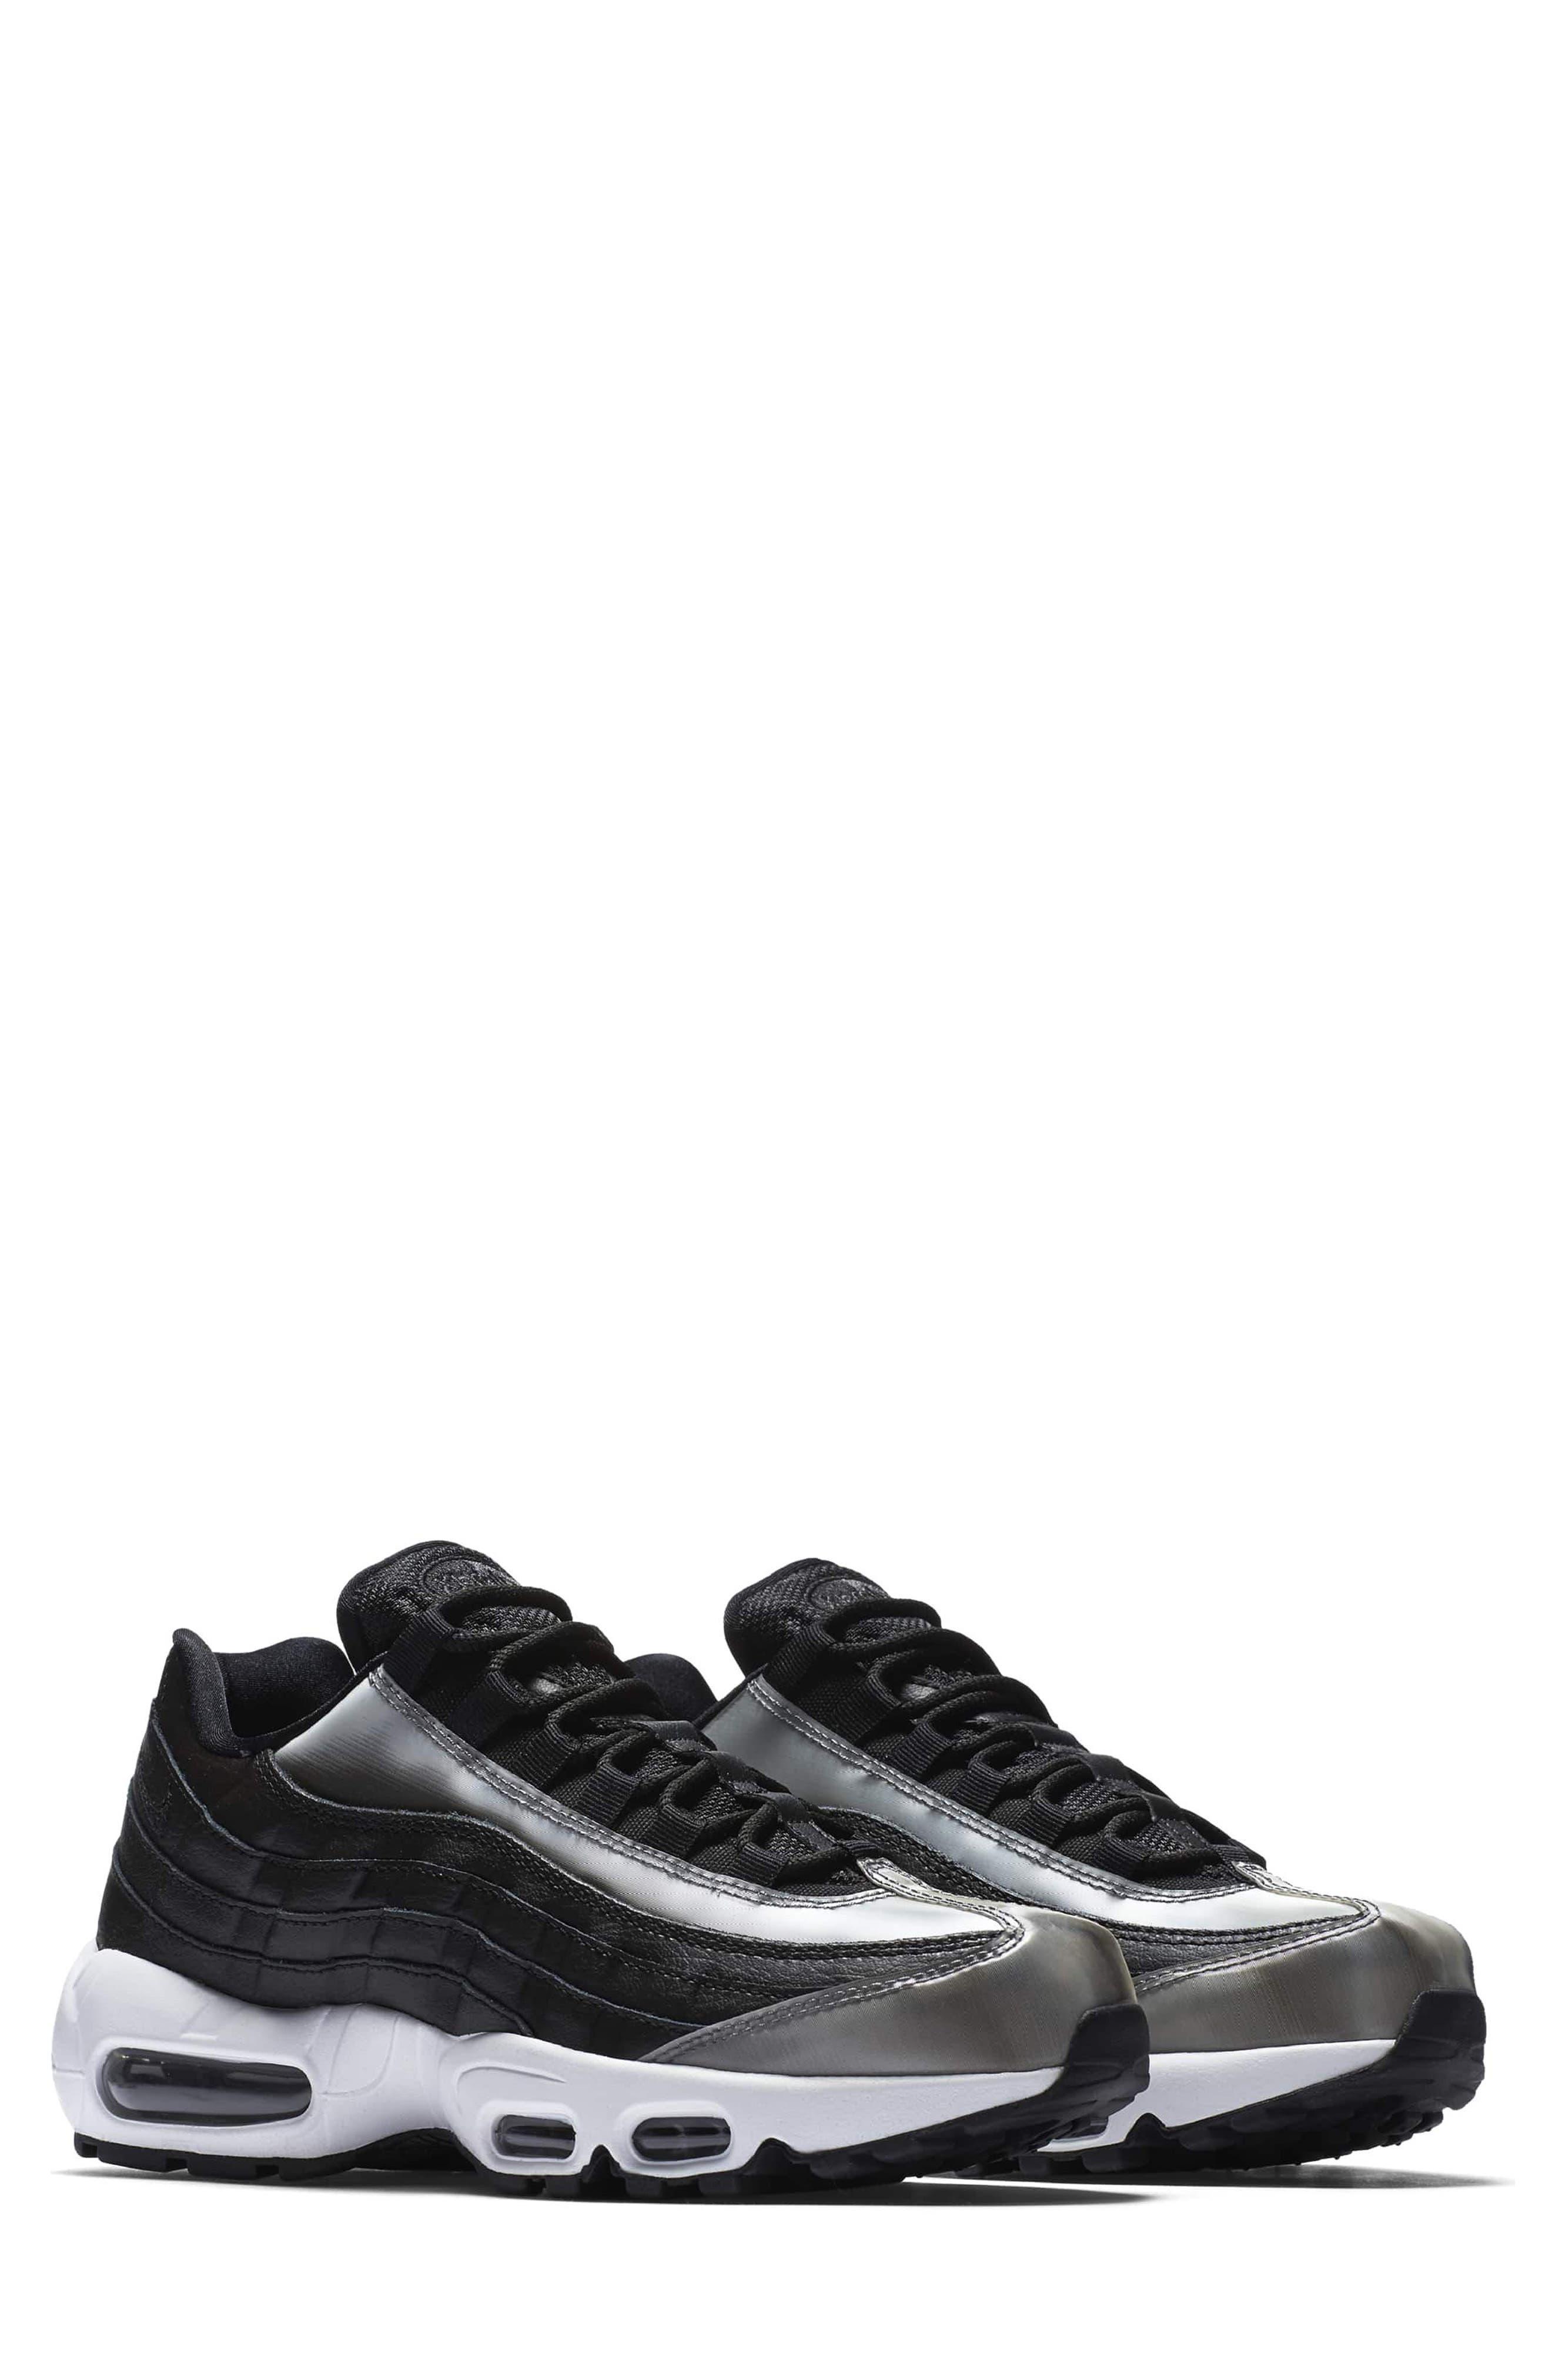 Main Image - Nike Air Max 95 SE Running Shoe (Women)